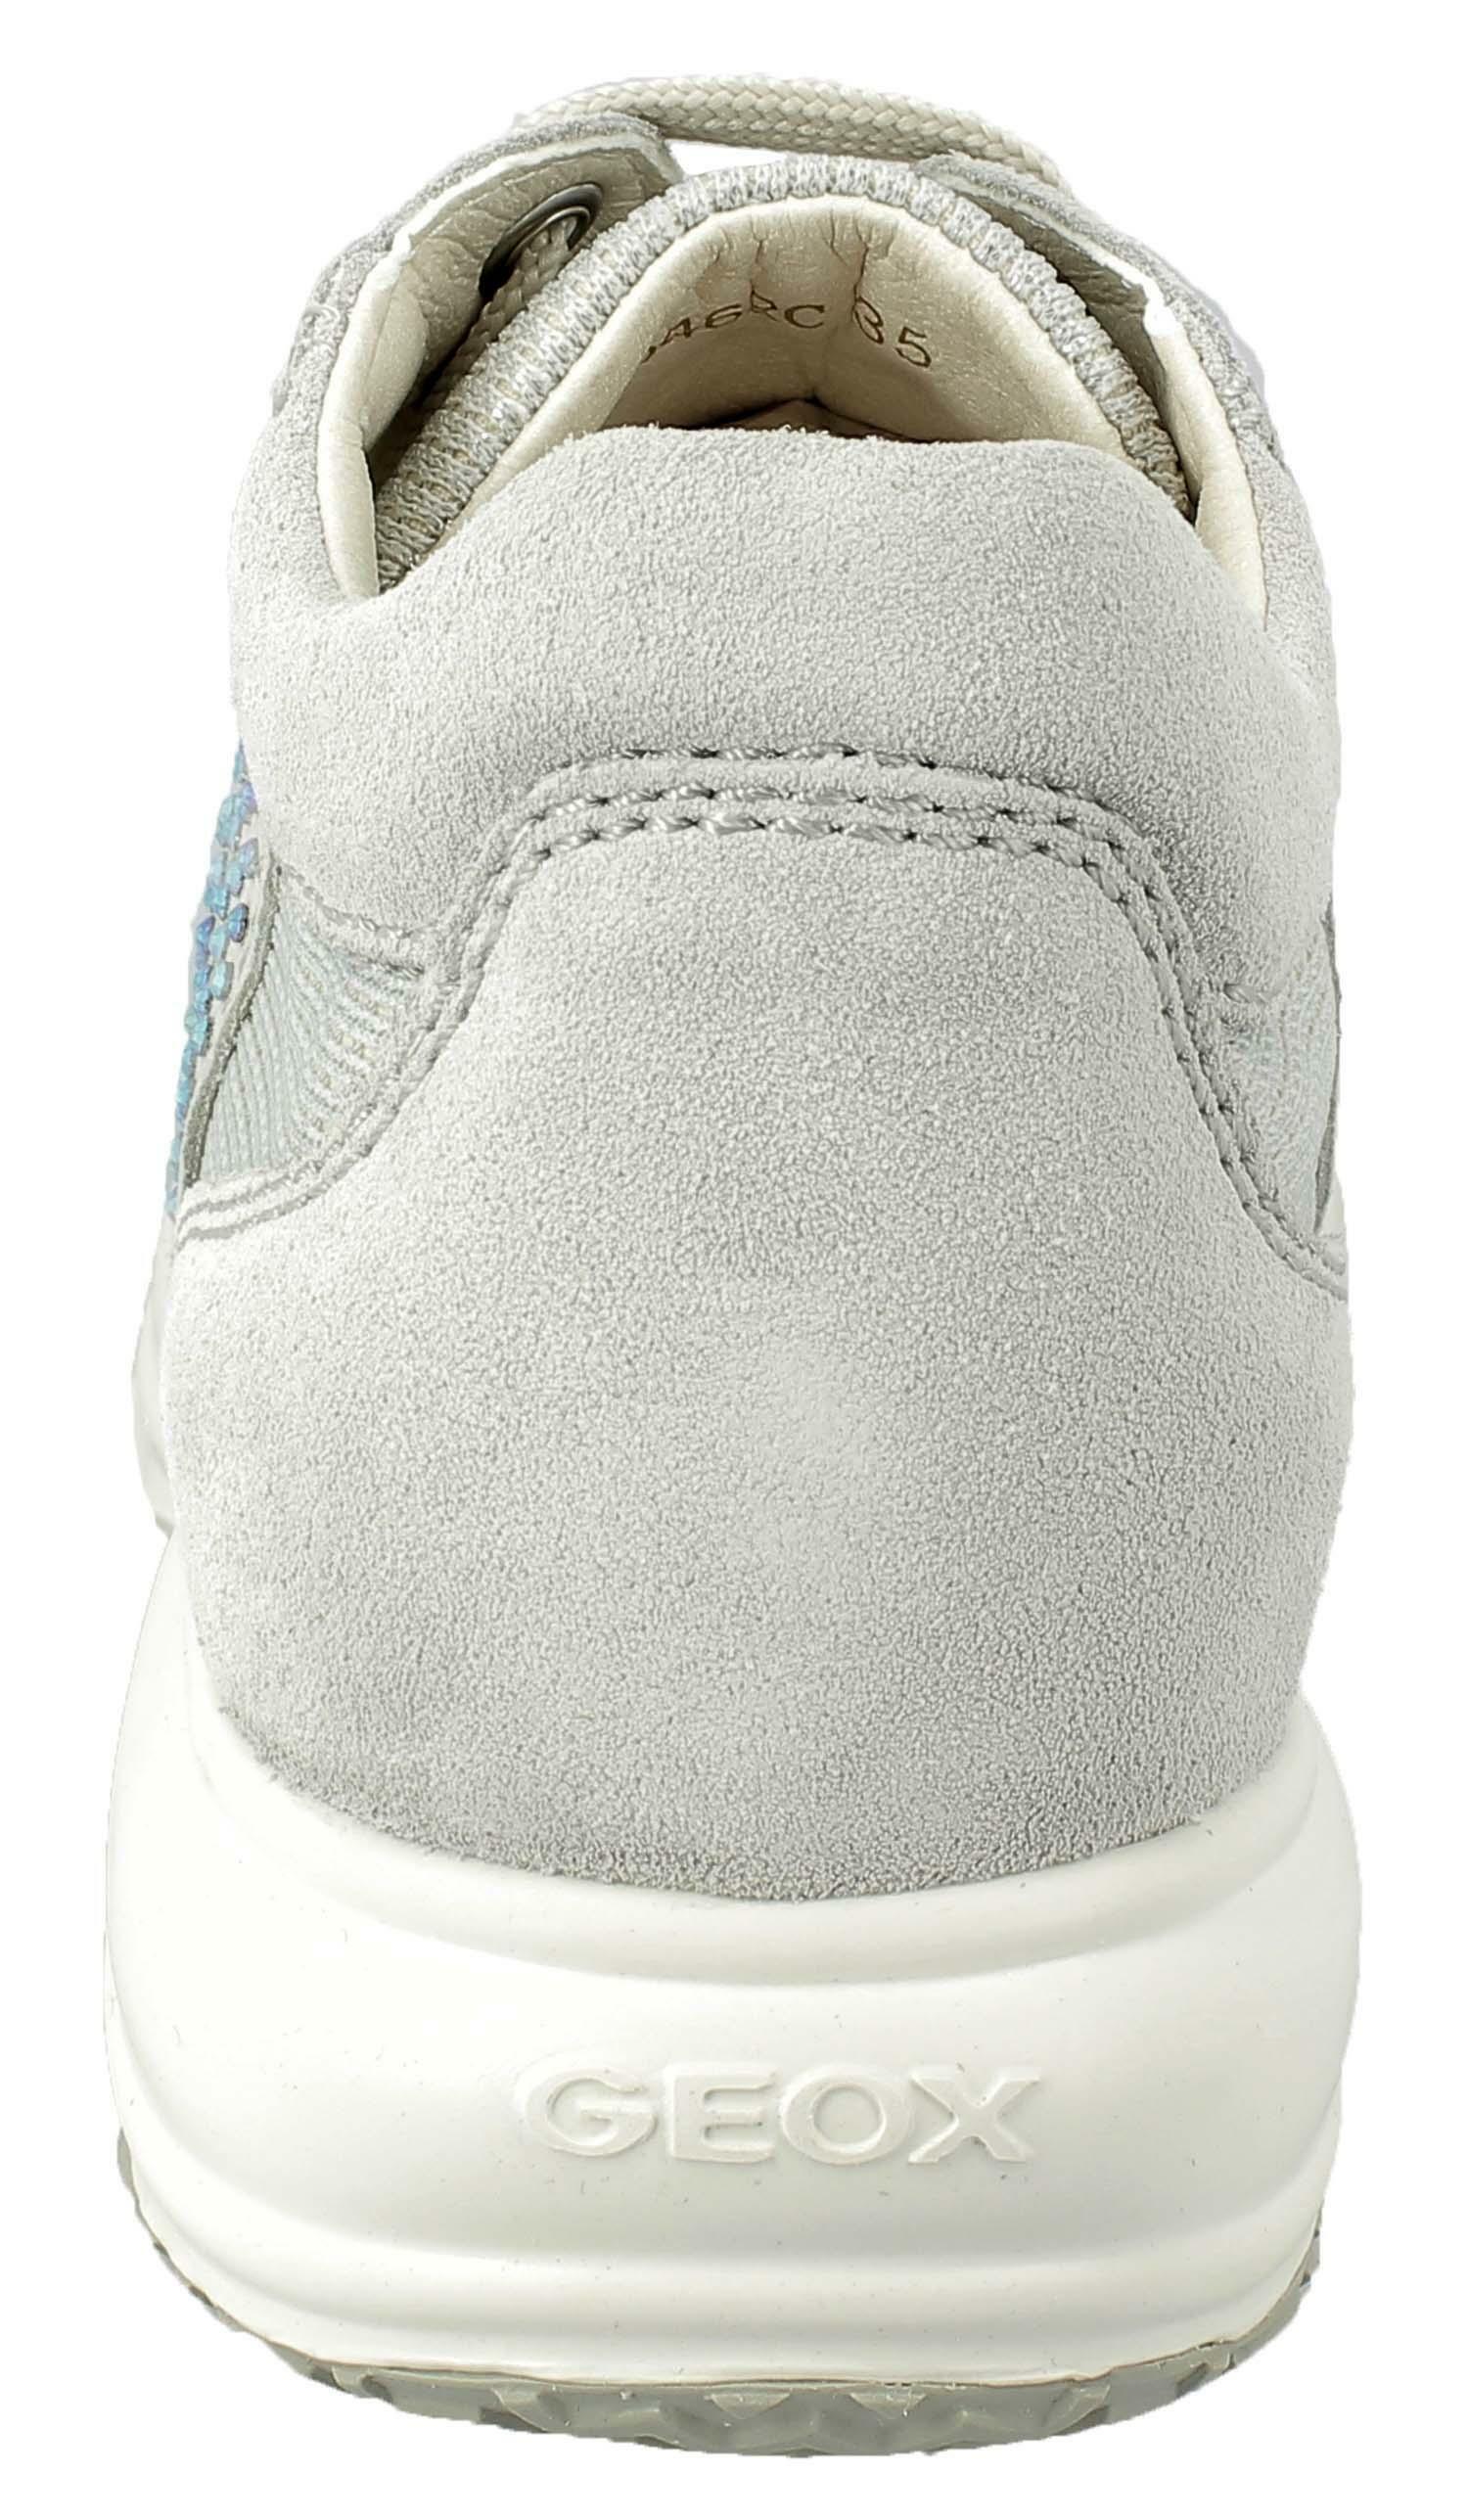 geox d happy c scarpe donna grigie d5462cc0626